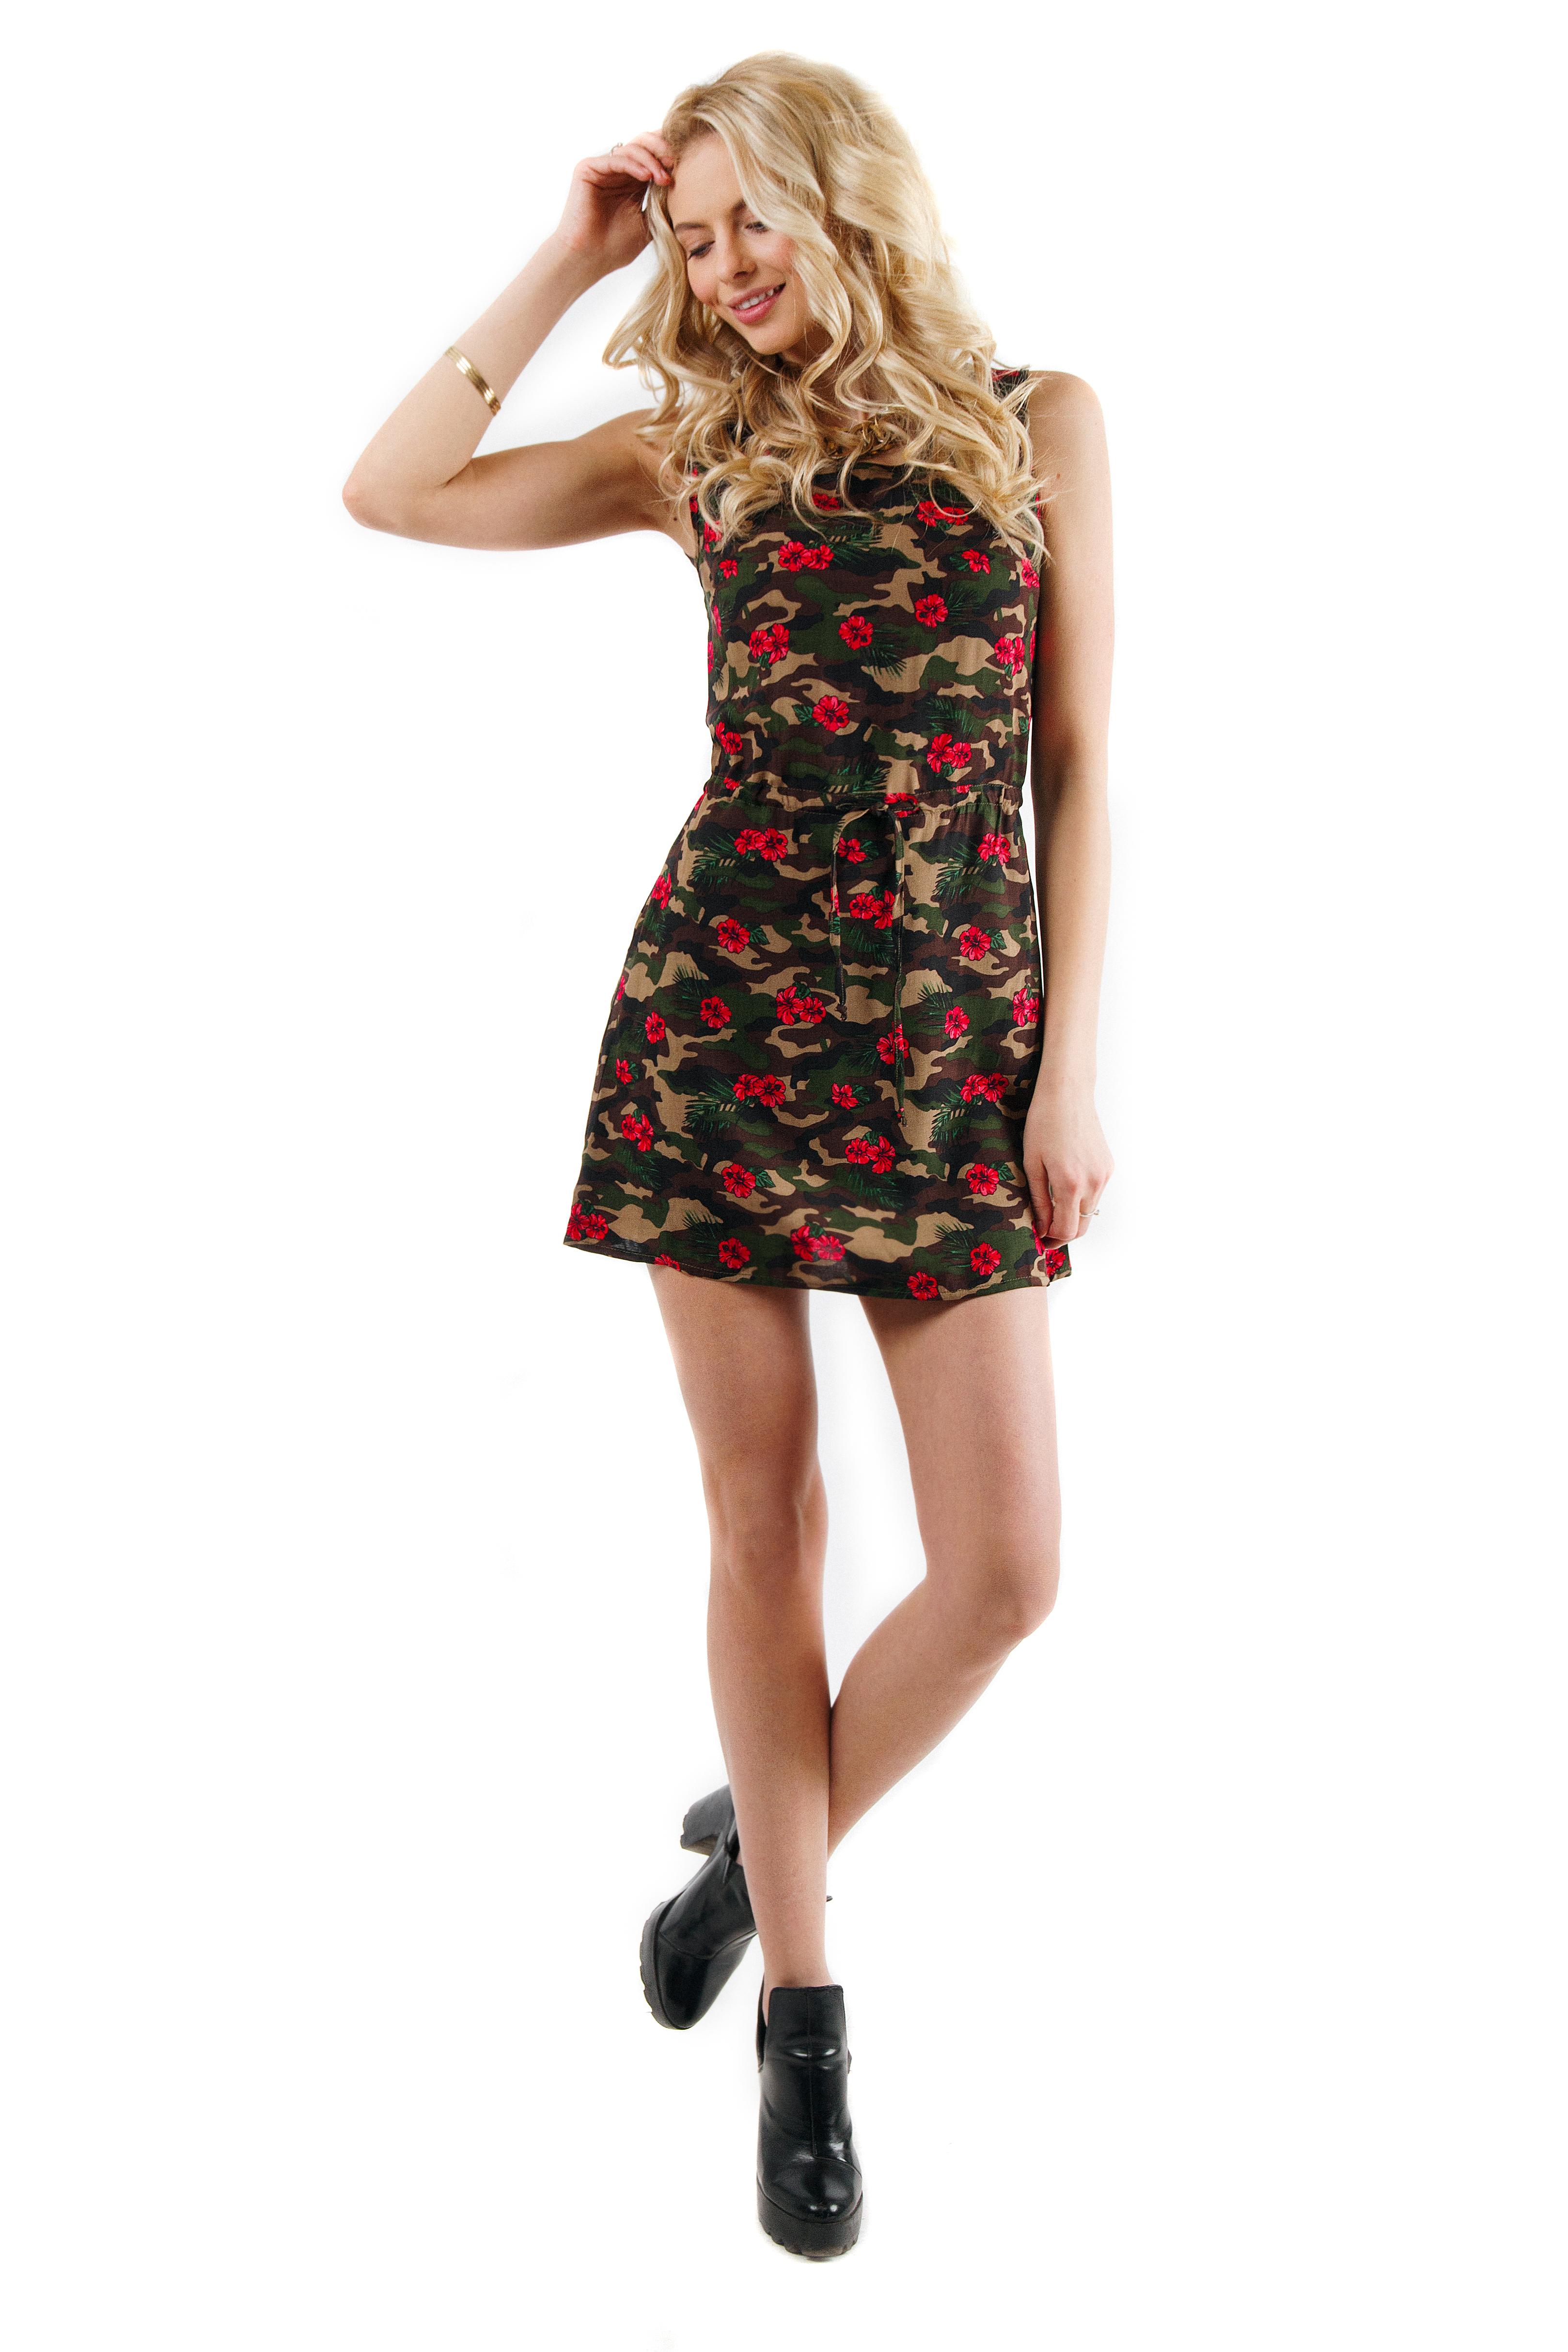 Womens dress Camo flowers